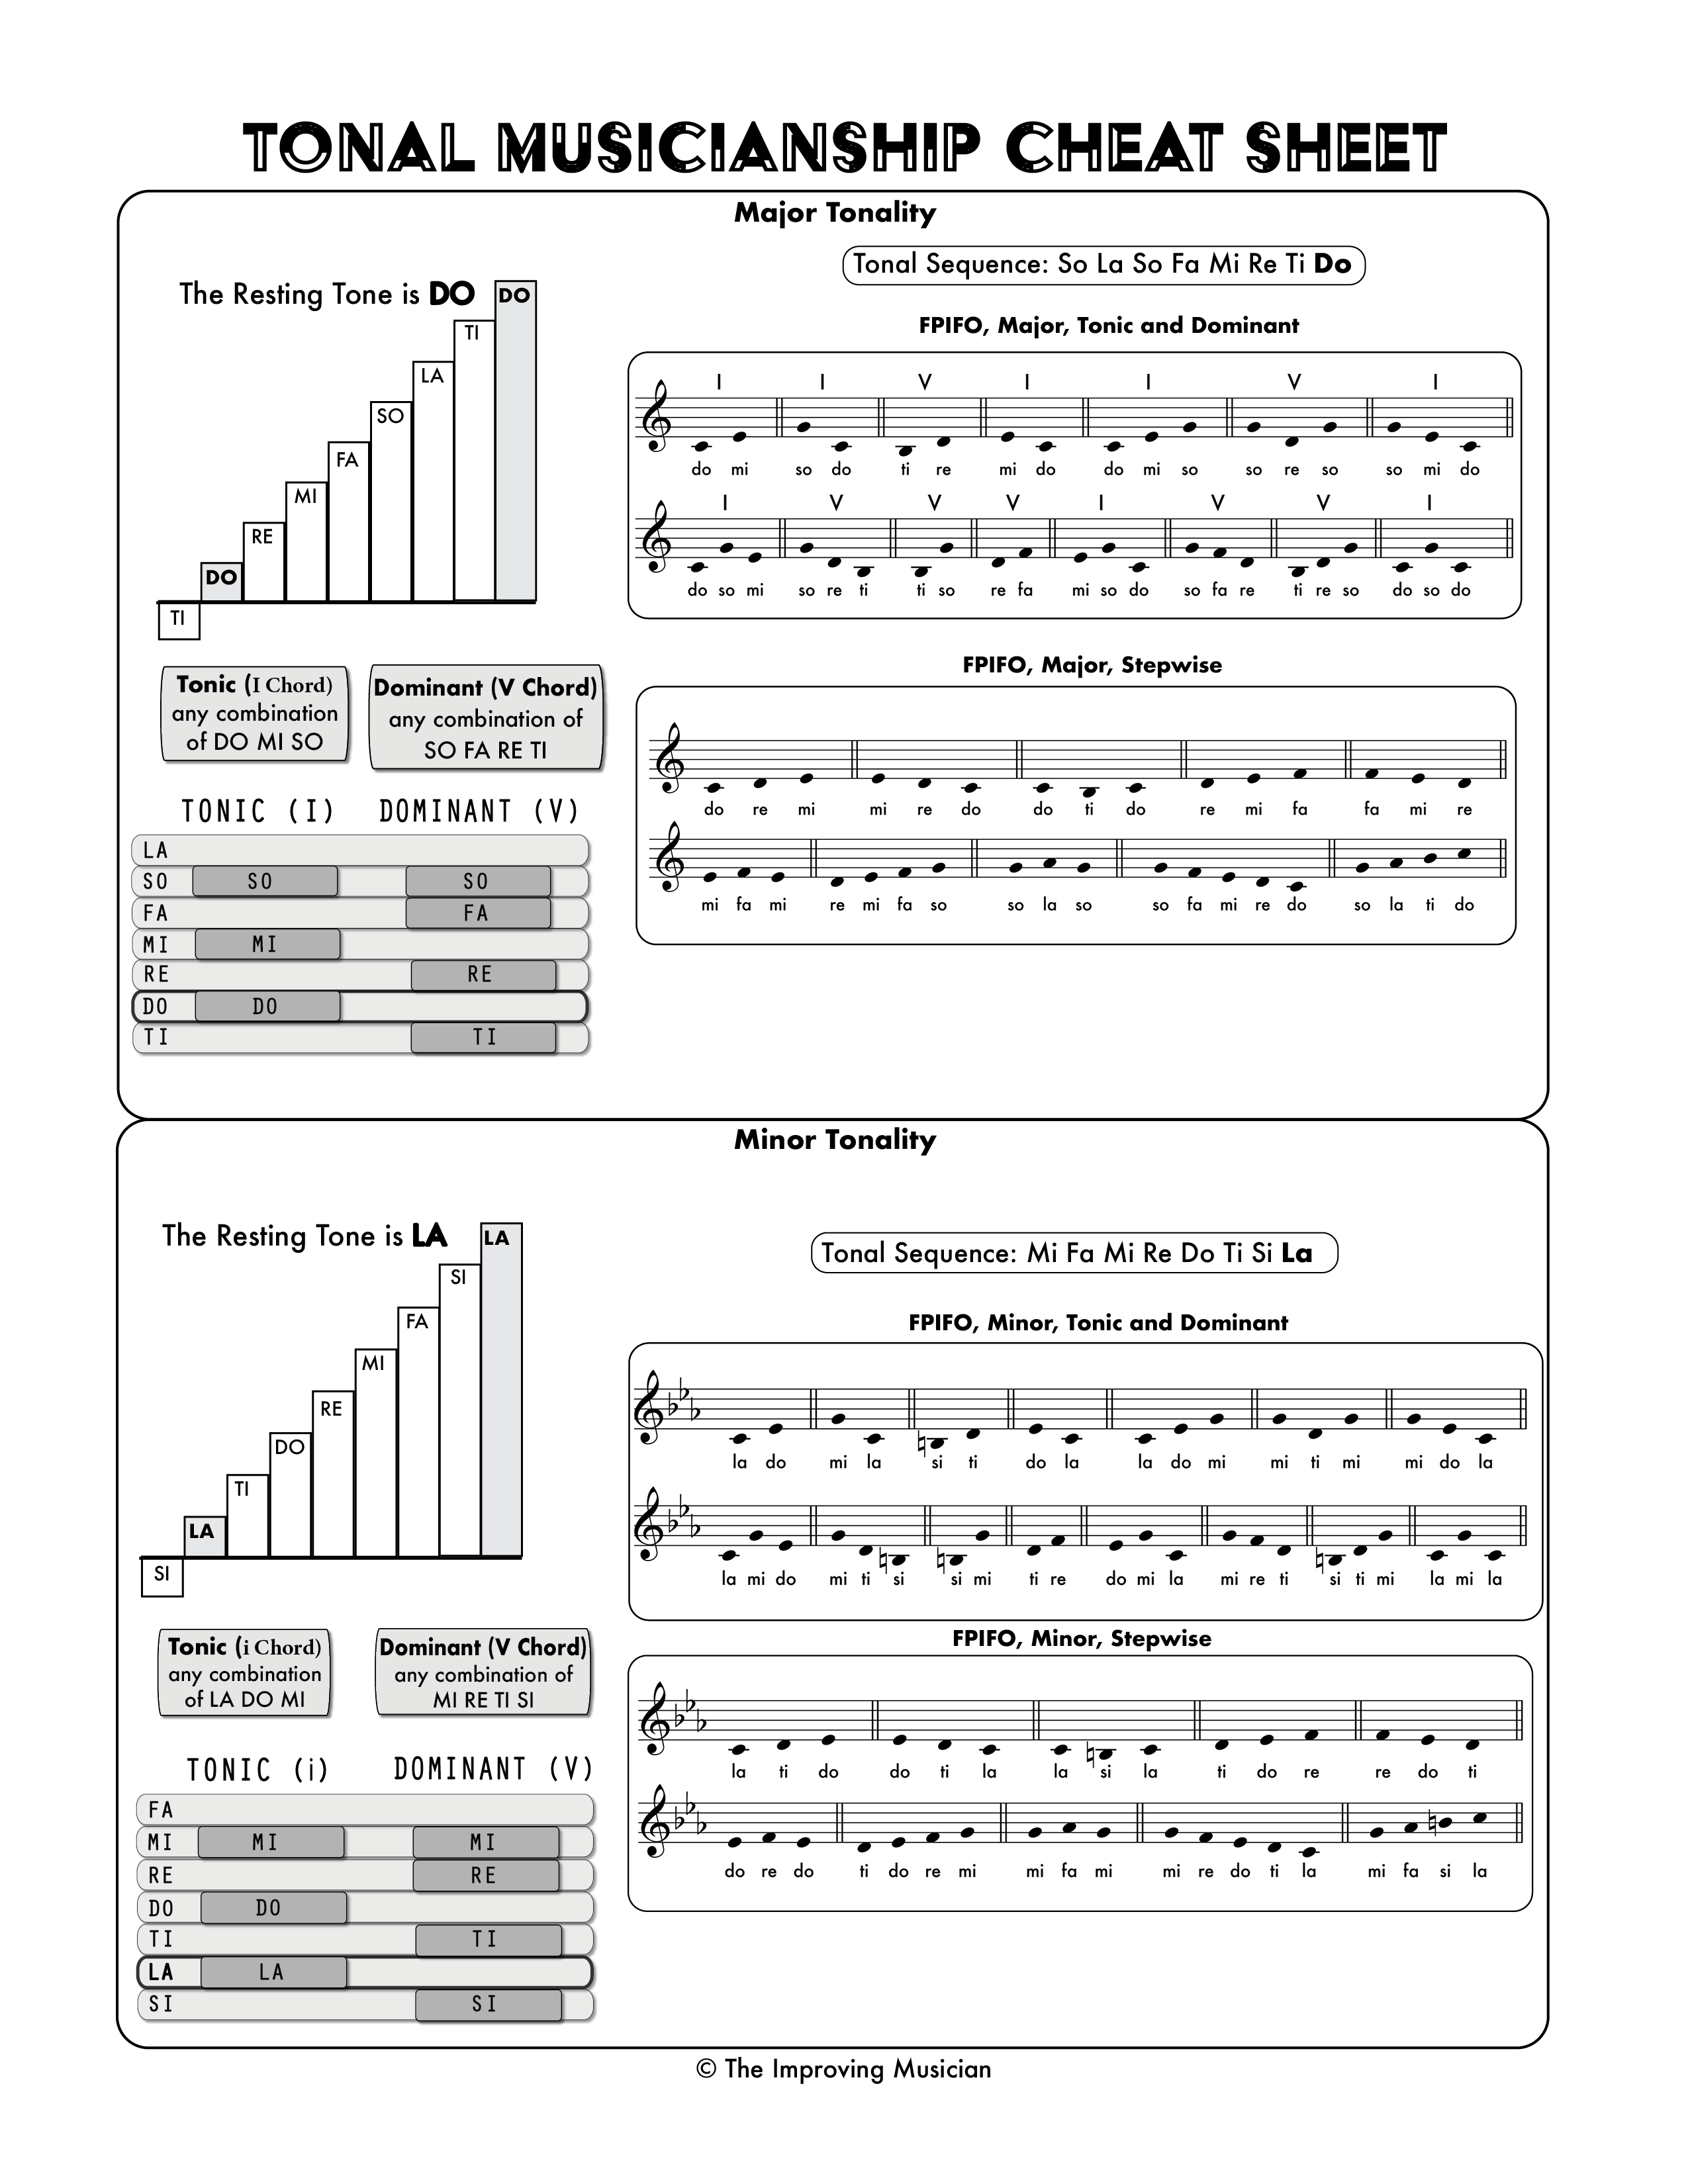 Tonal Musicianship Cheat Sheet - Student Library